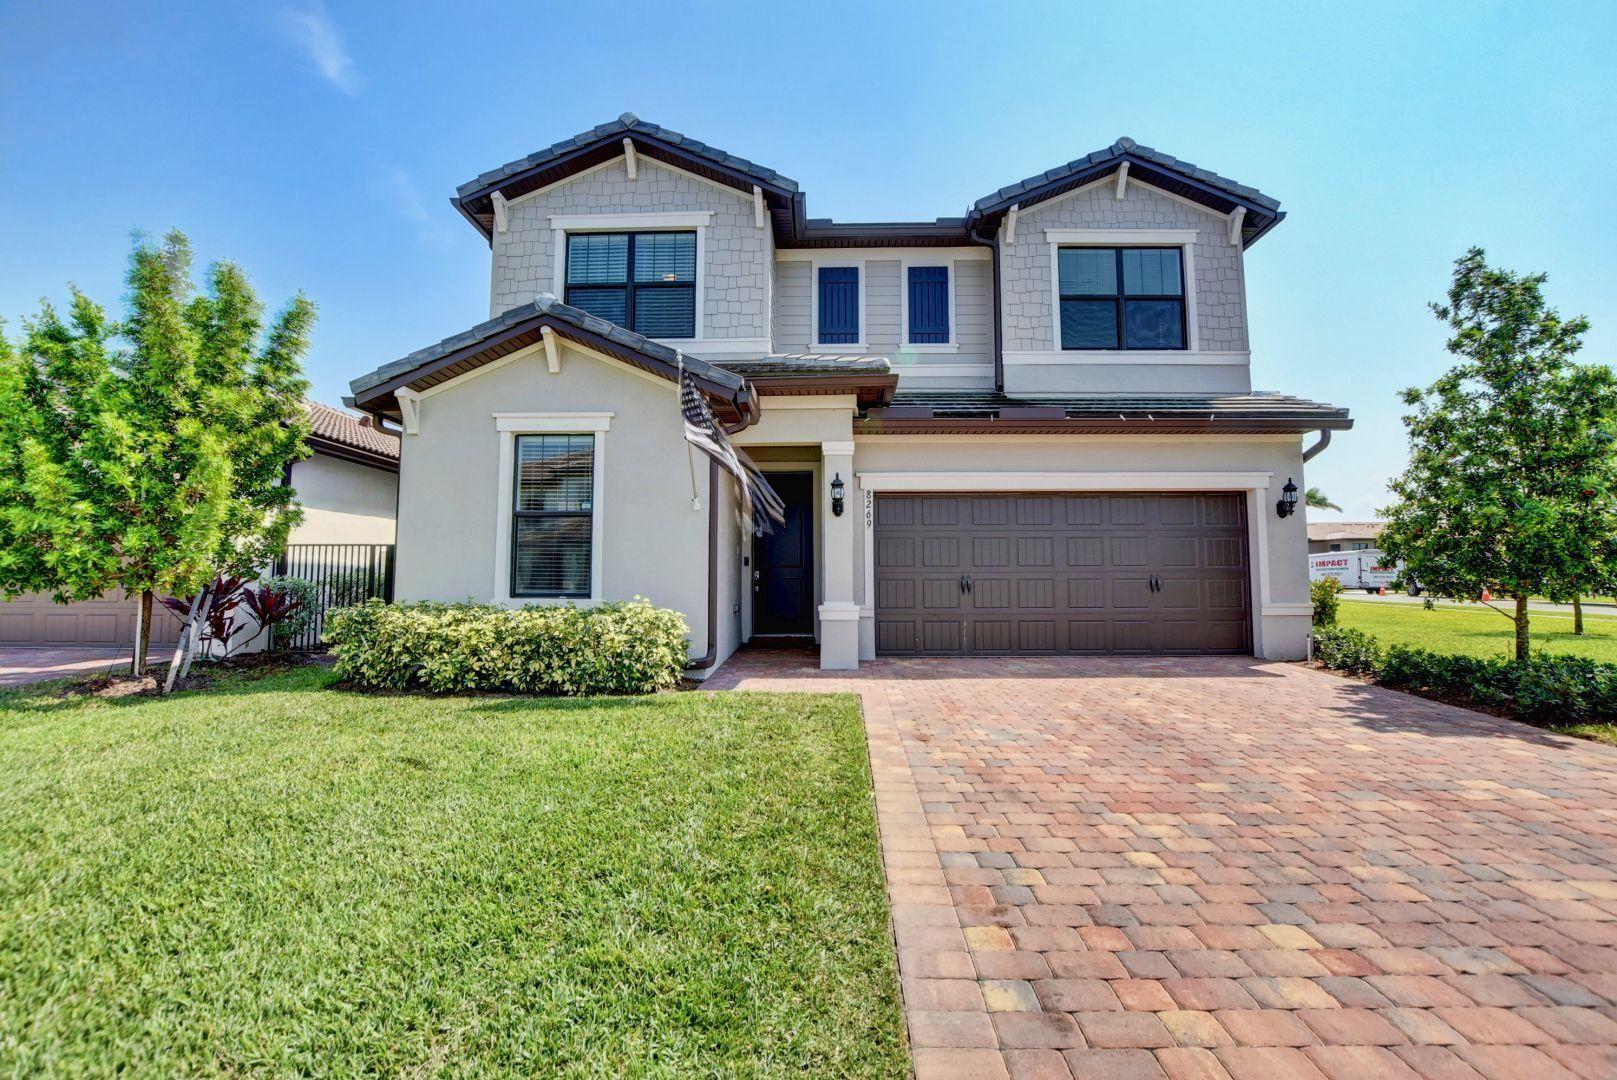 8269 Hanoverian Drive, Lake Worth, FL 33467 - #: RX-10616800